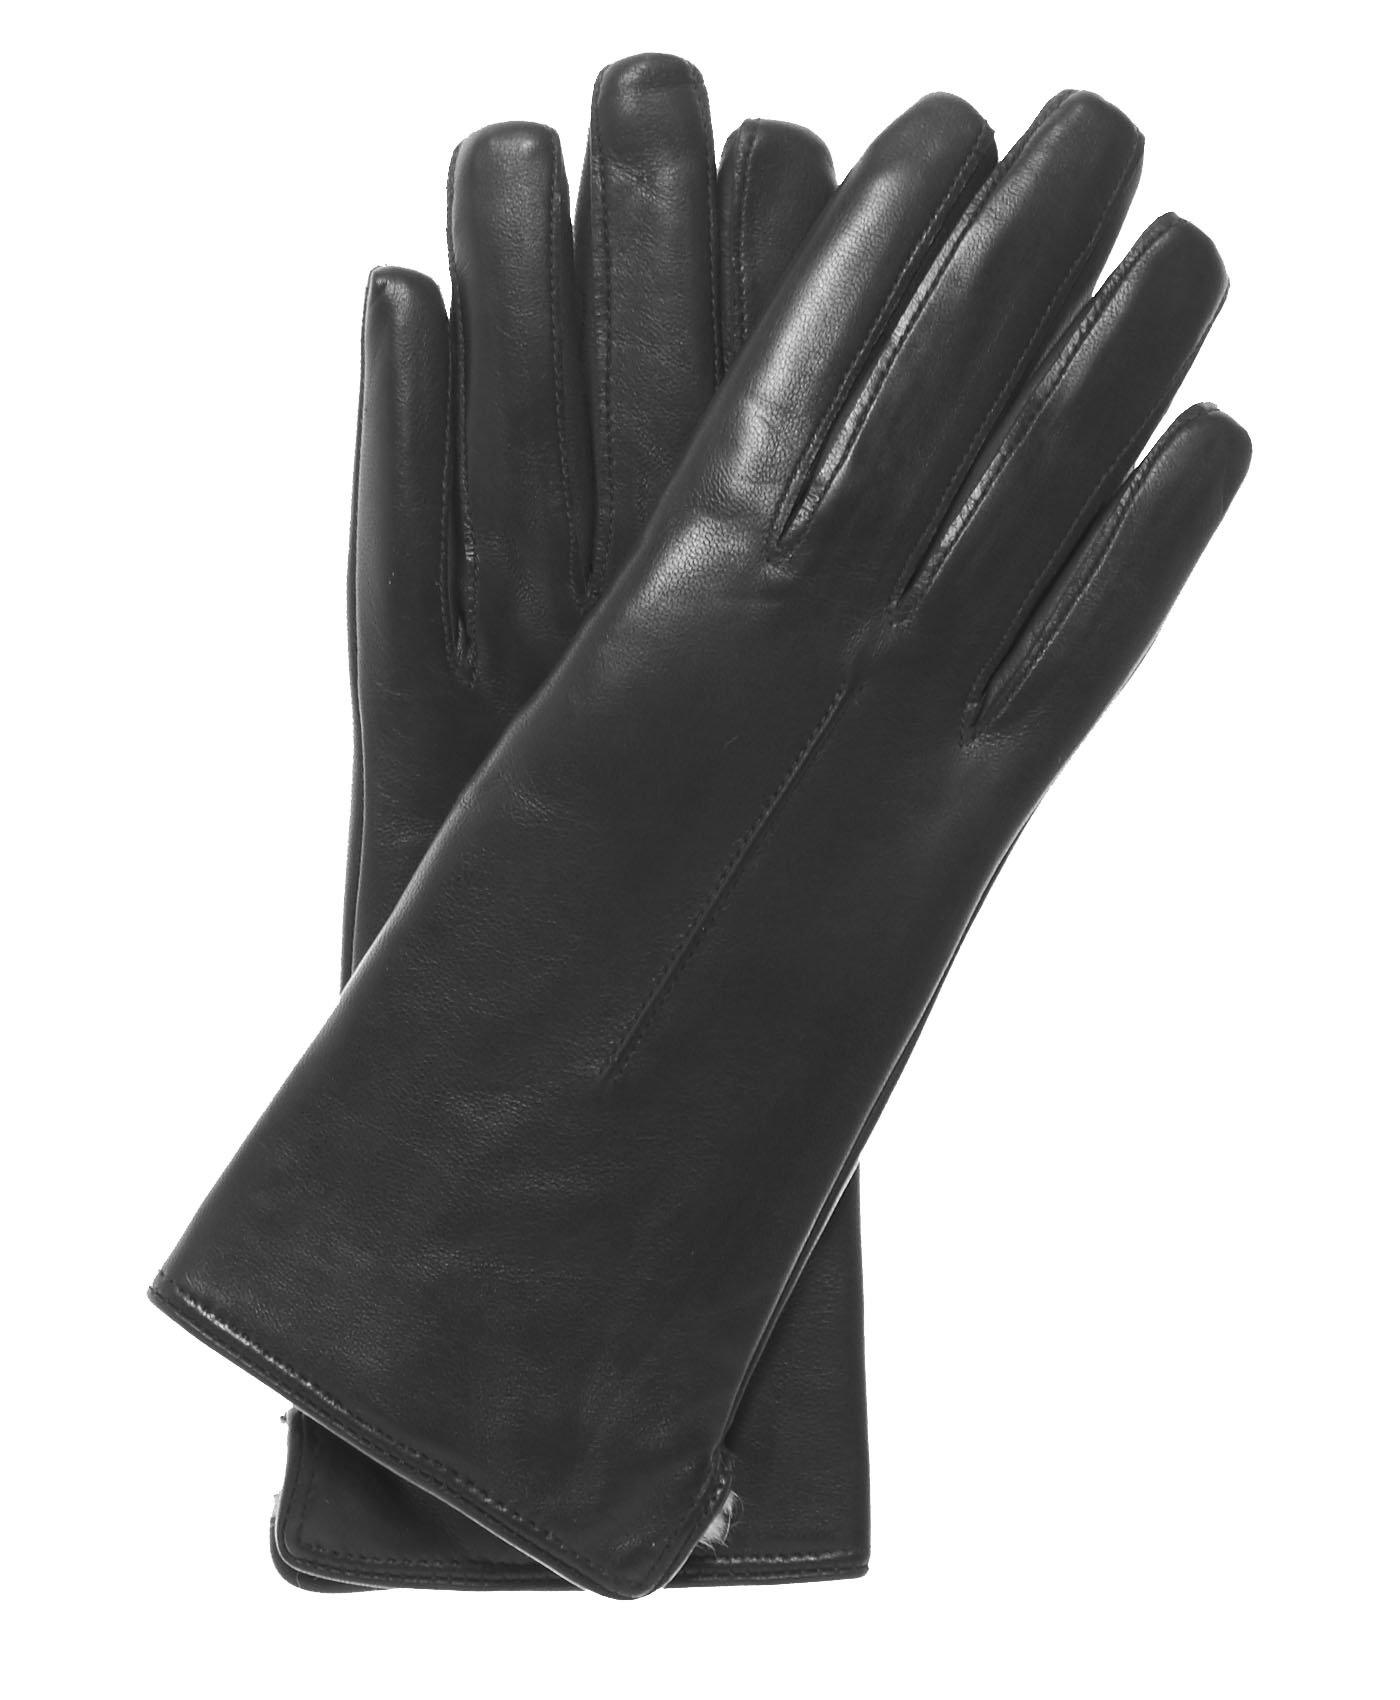 Fratelli Orsini Everyday Women's Our Bestselling Italian Rabbit Fur Gloves Size 7 1/2 Color Black